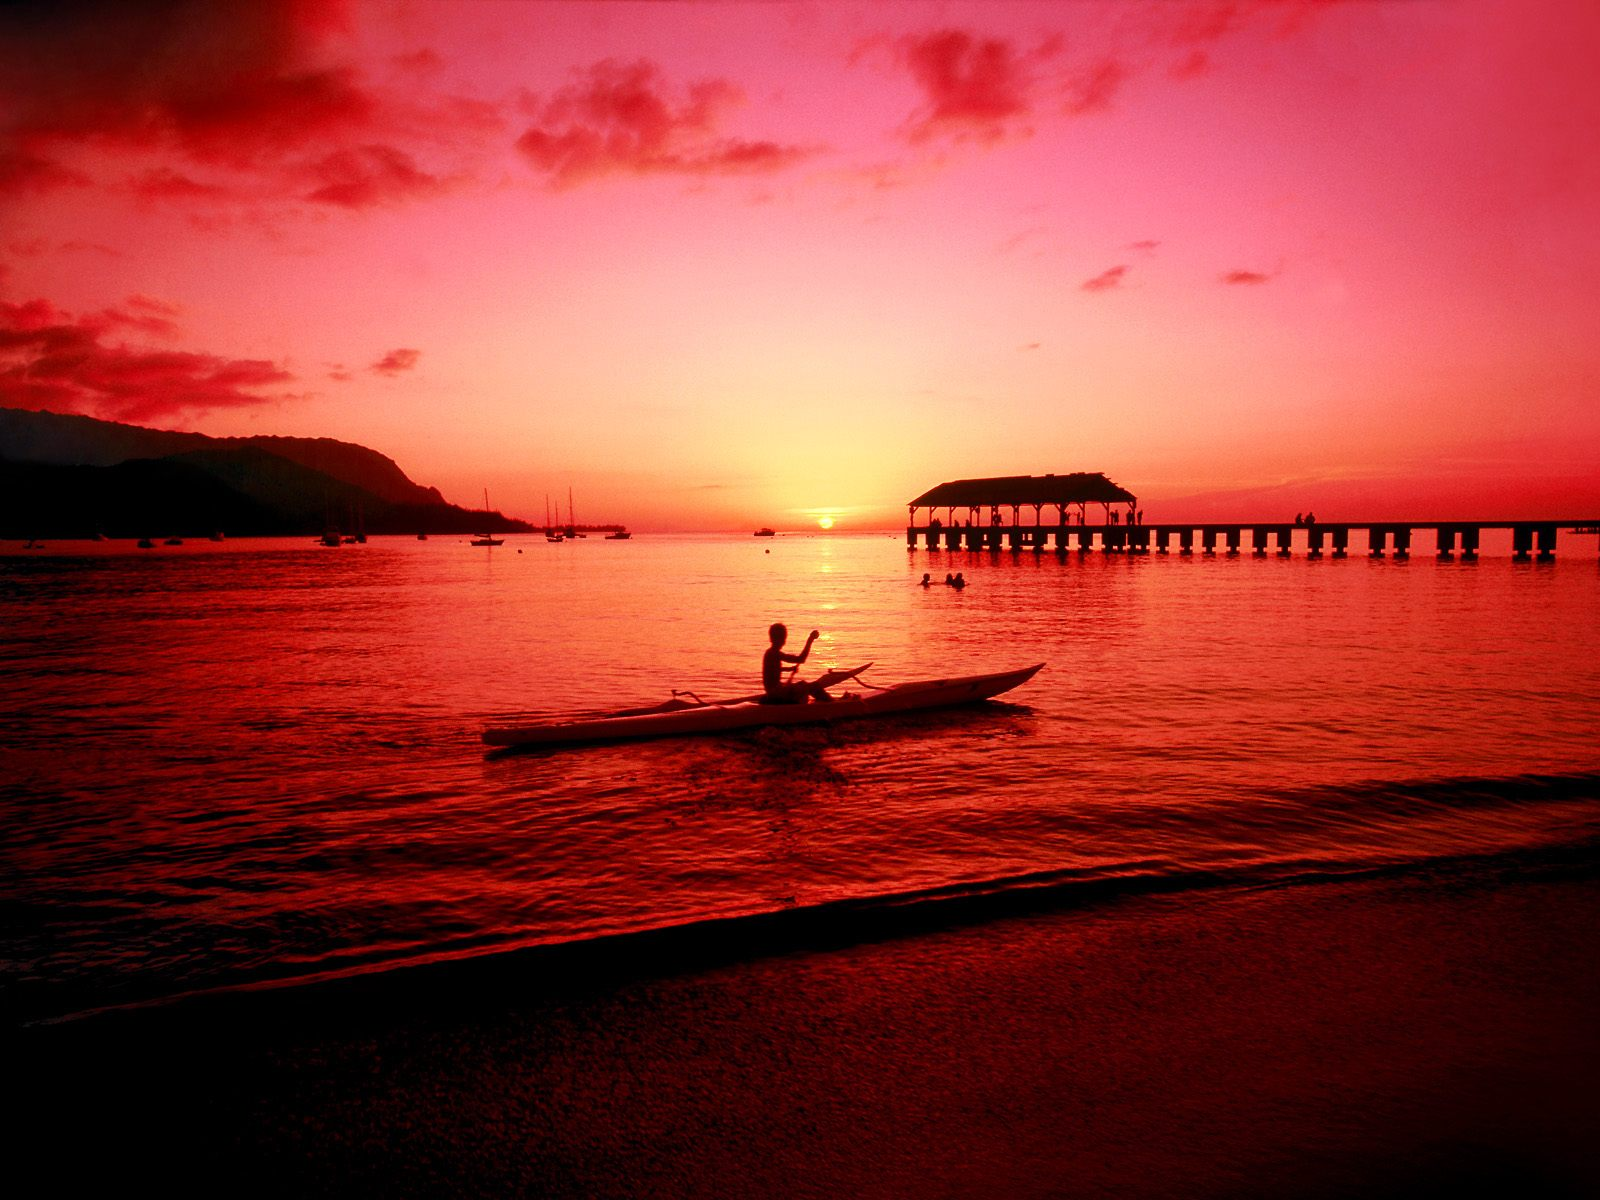 hawaii beach sunset | free stockphoto